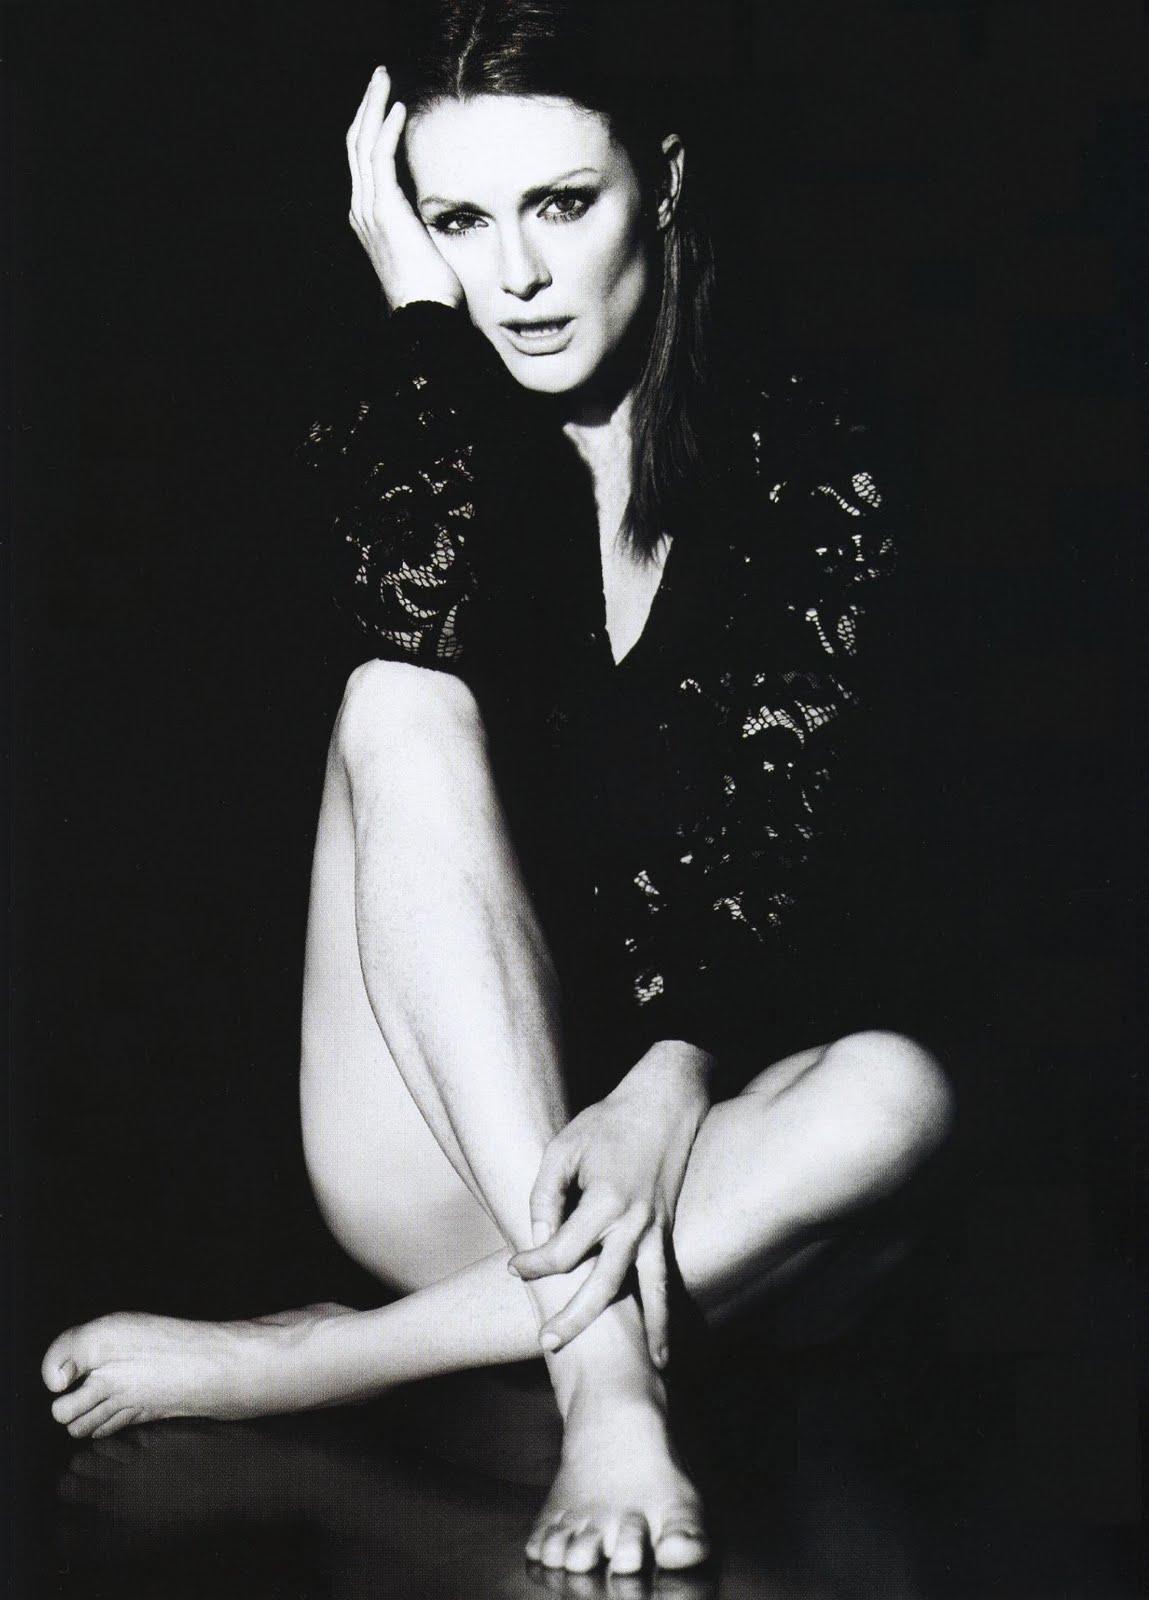 http://4.bp.blogspot.com/_bQ0SqifjNcg/S-uCrL9qImI/AAAAAAAAUh0/7mBY7DXsdCM/s1600/julianne-moore-feet-5.jpg